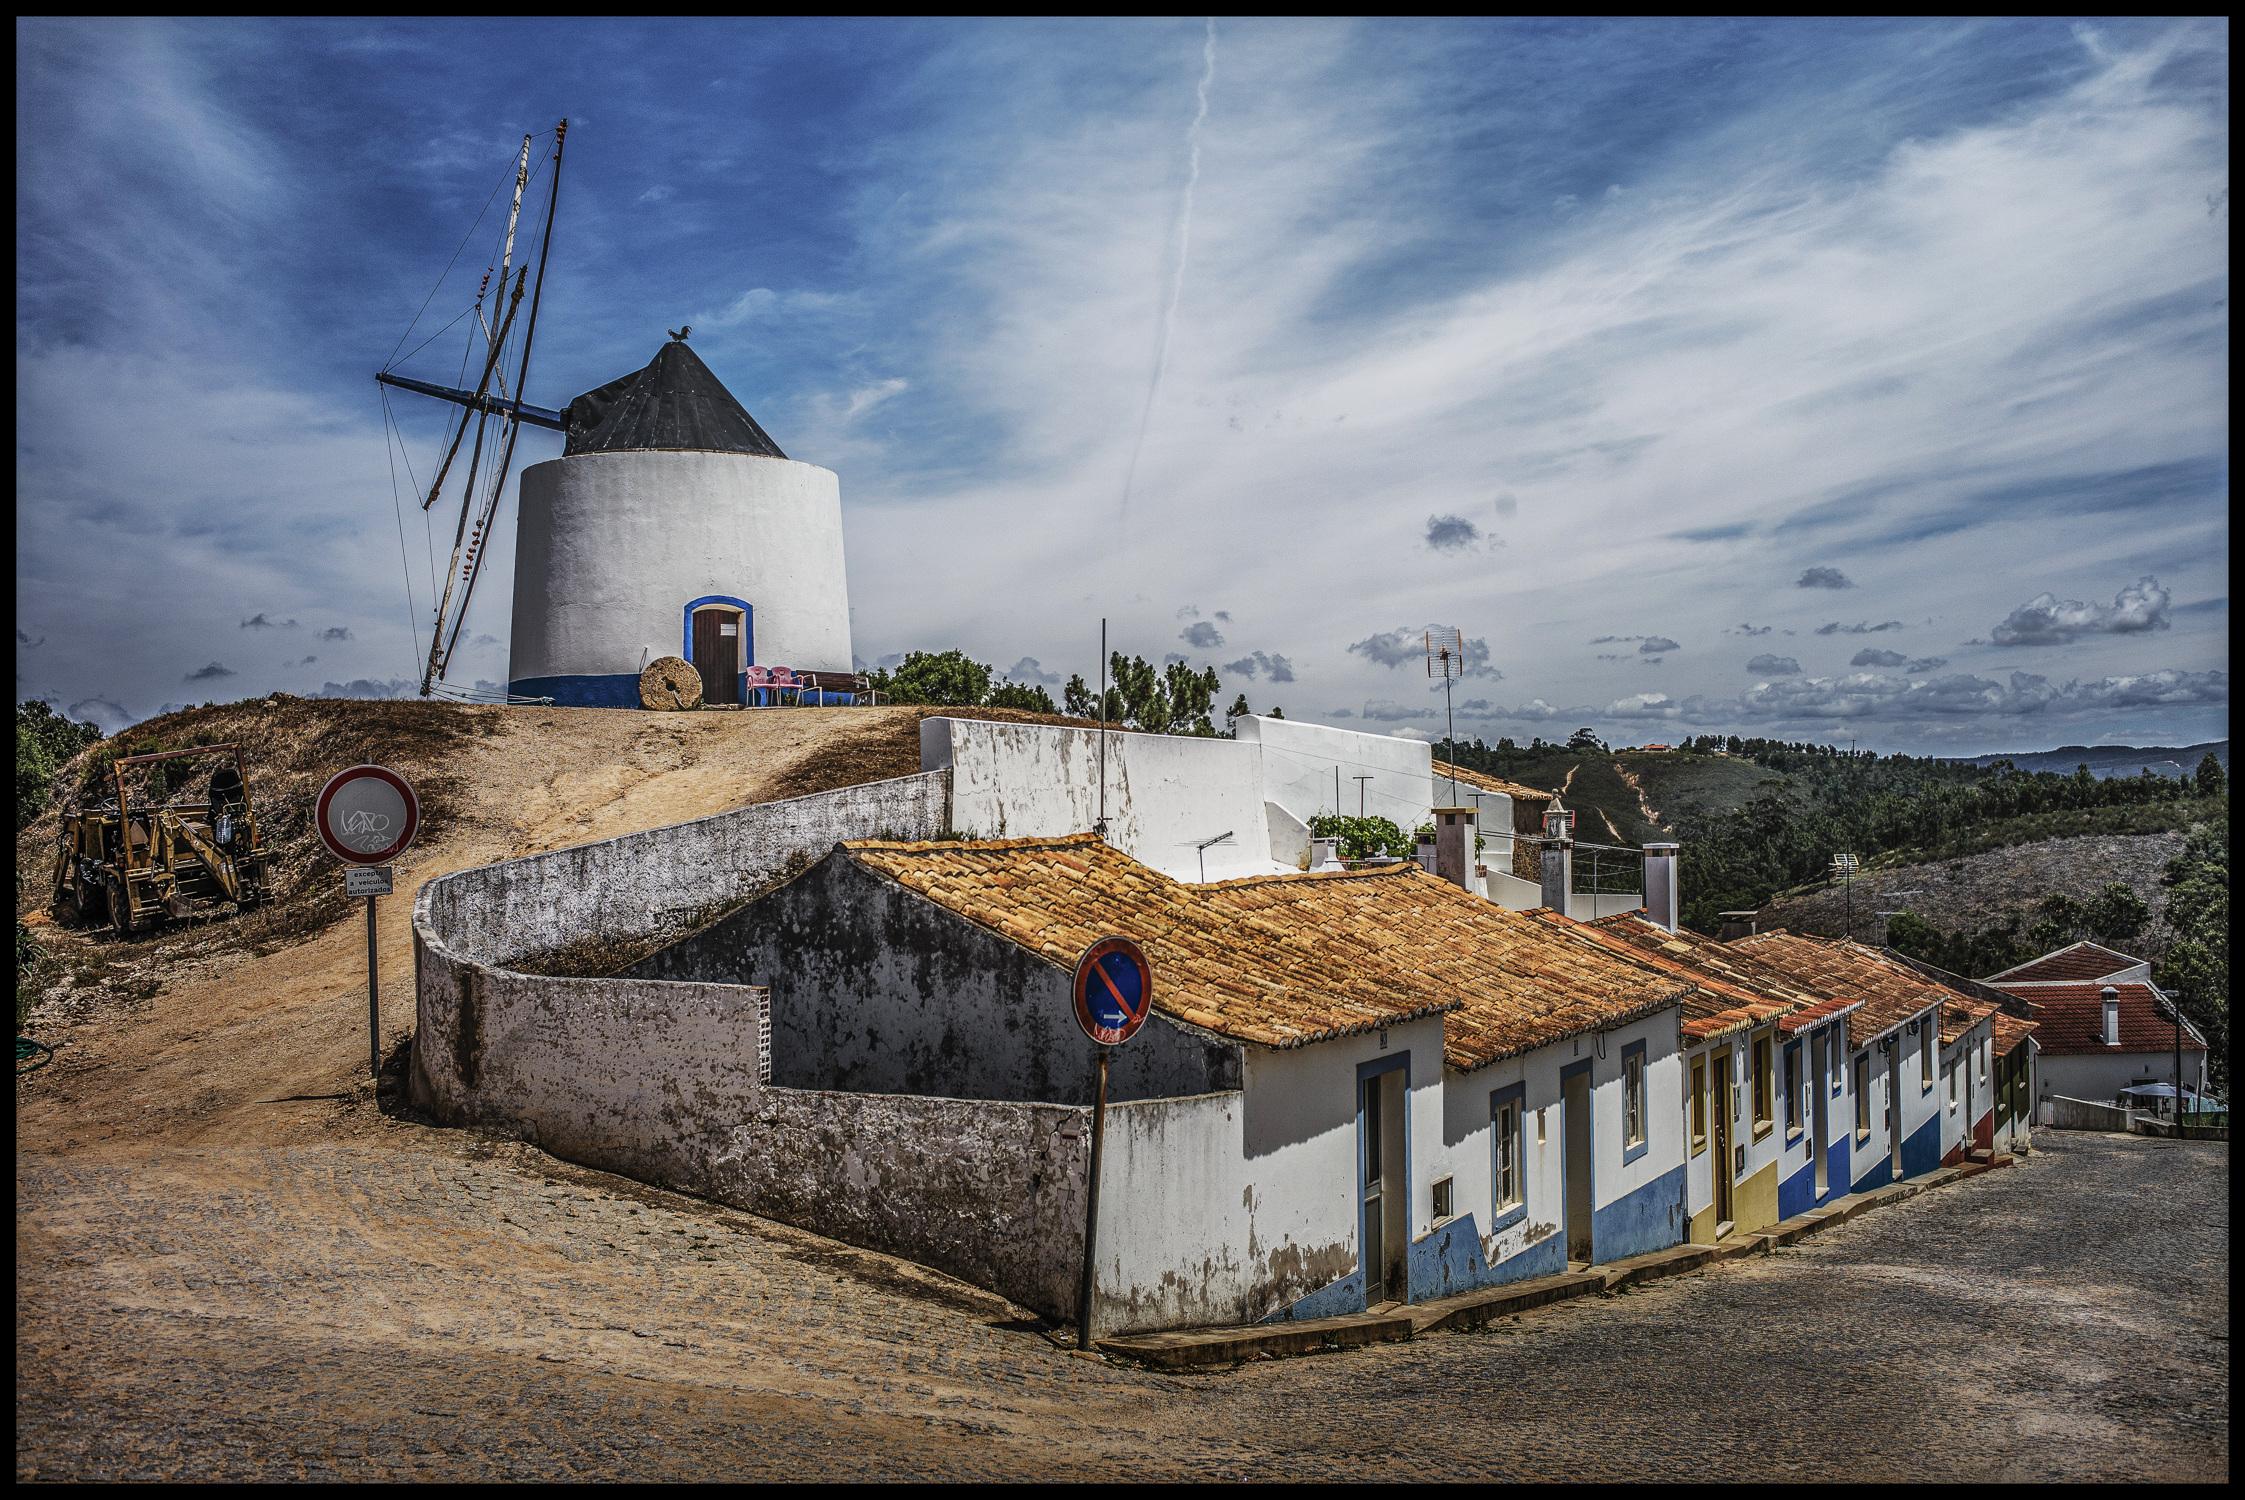 Odeceixe, Algarve, Portugal